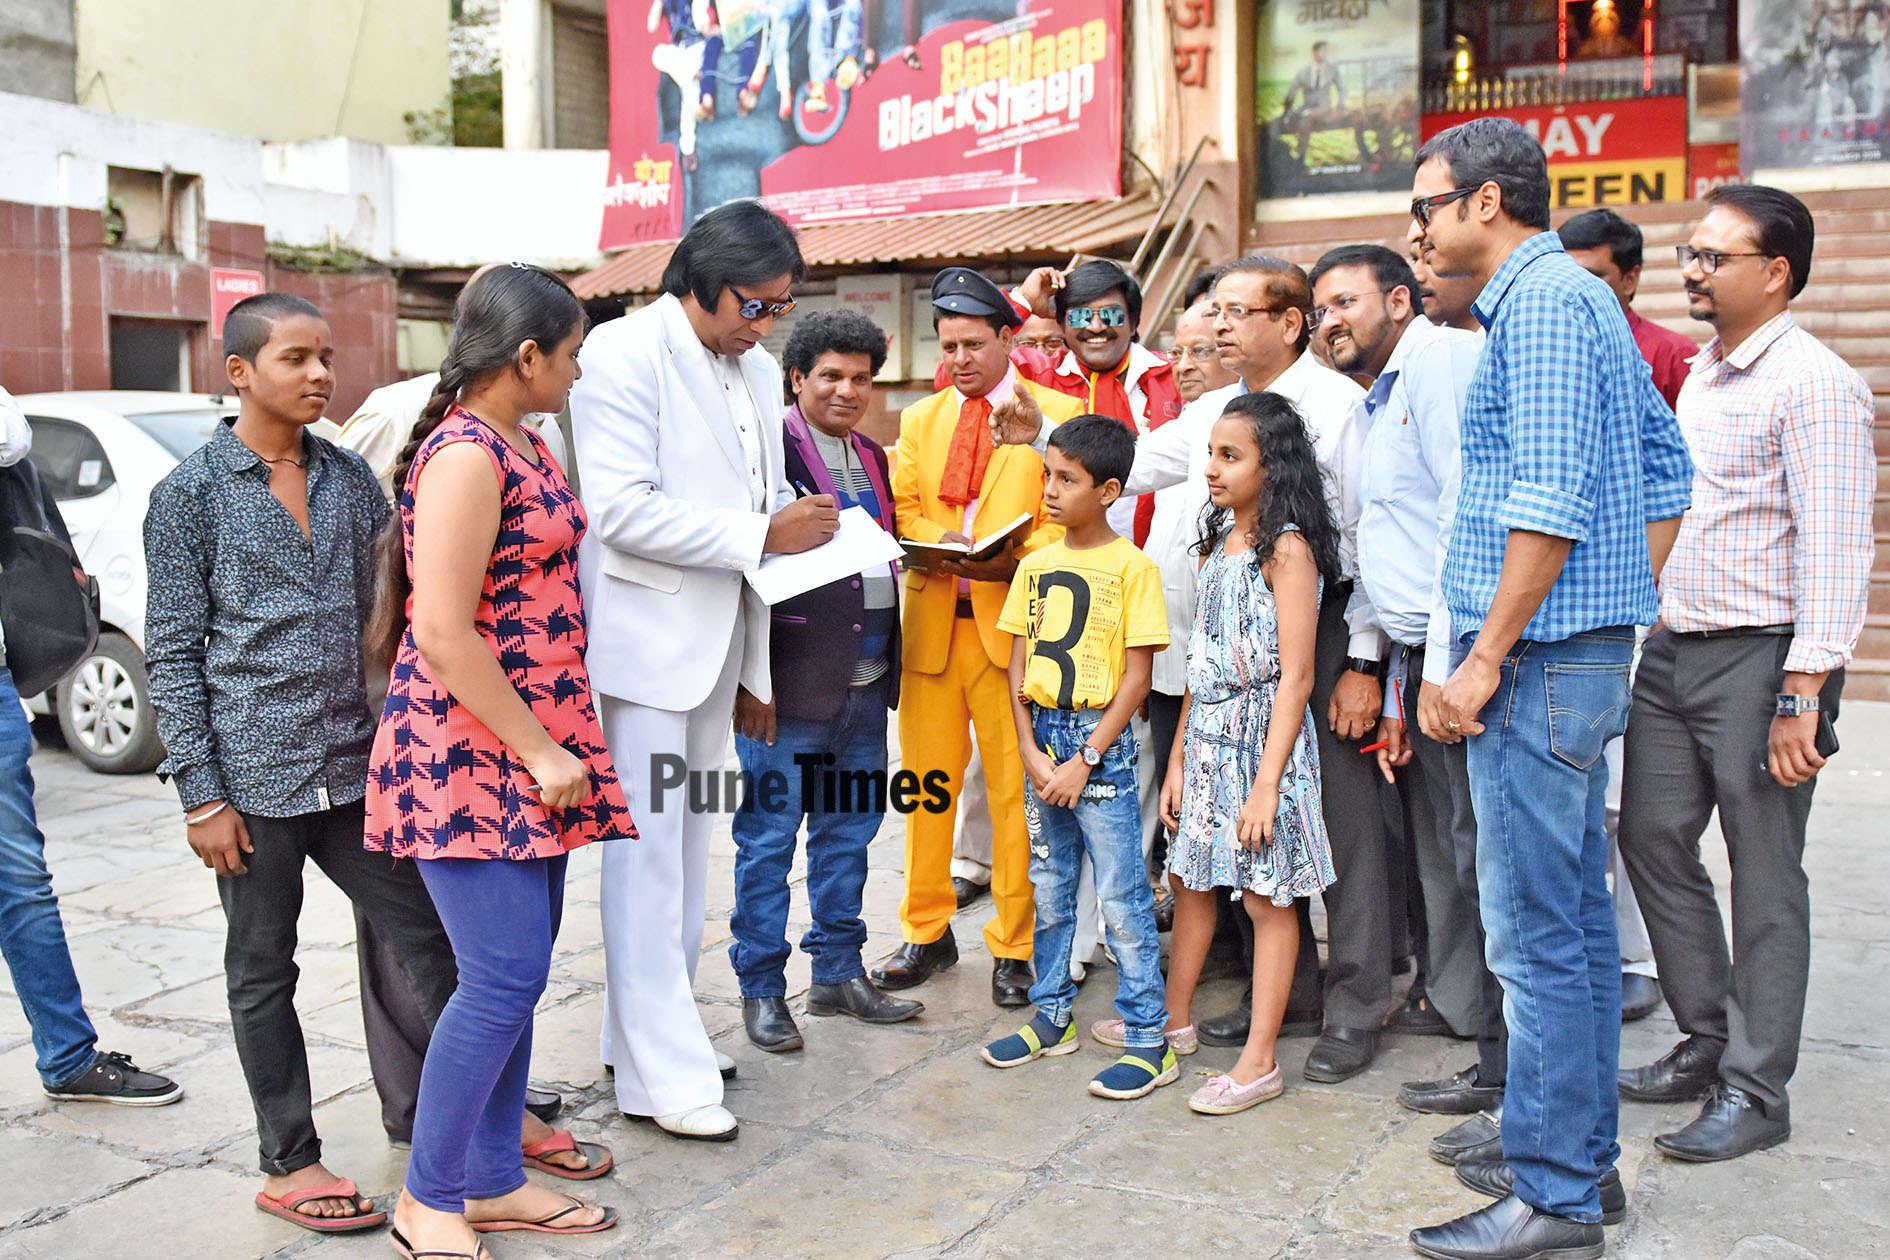 sabu ramesh tiwari: In celebrity shoes | Pune News - Times